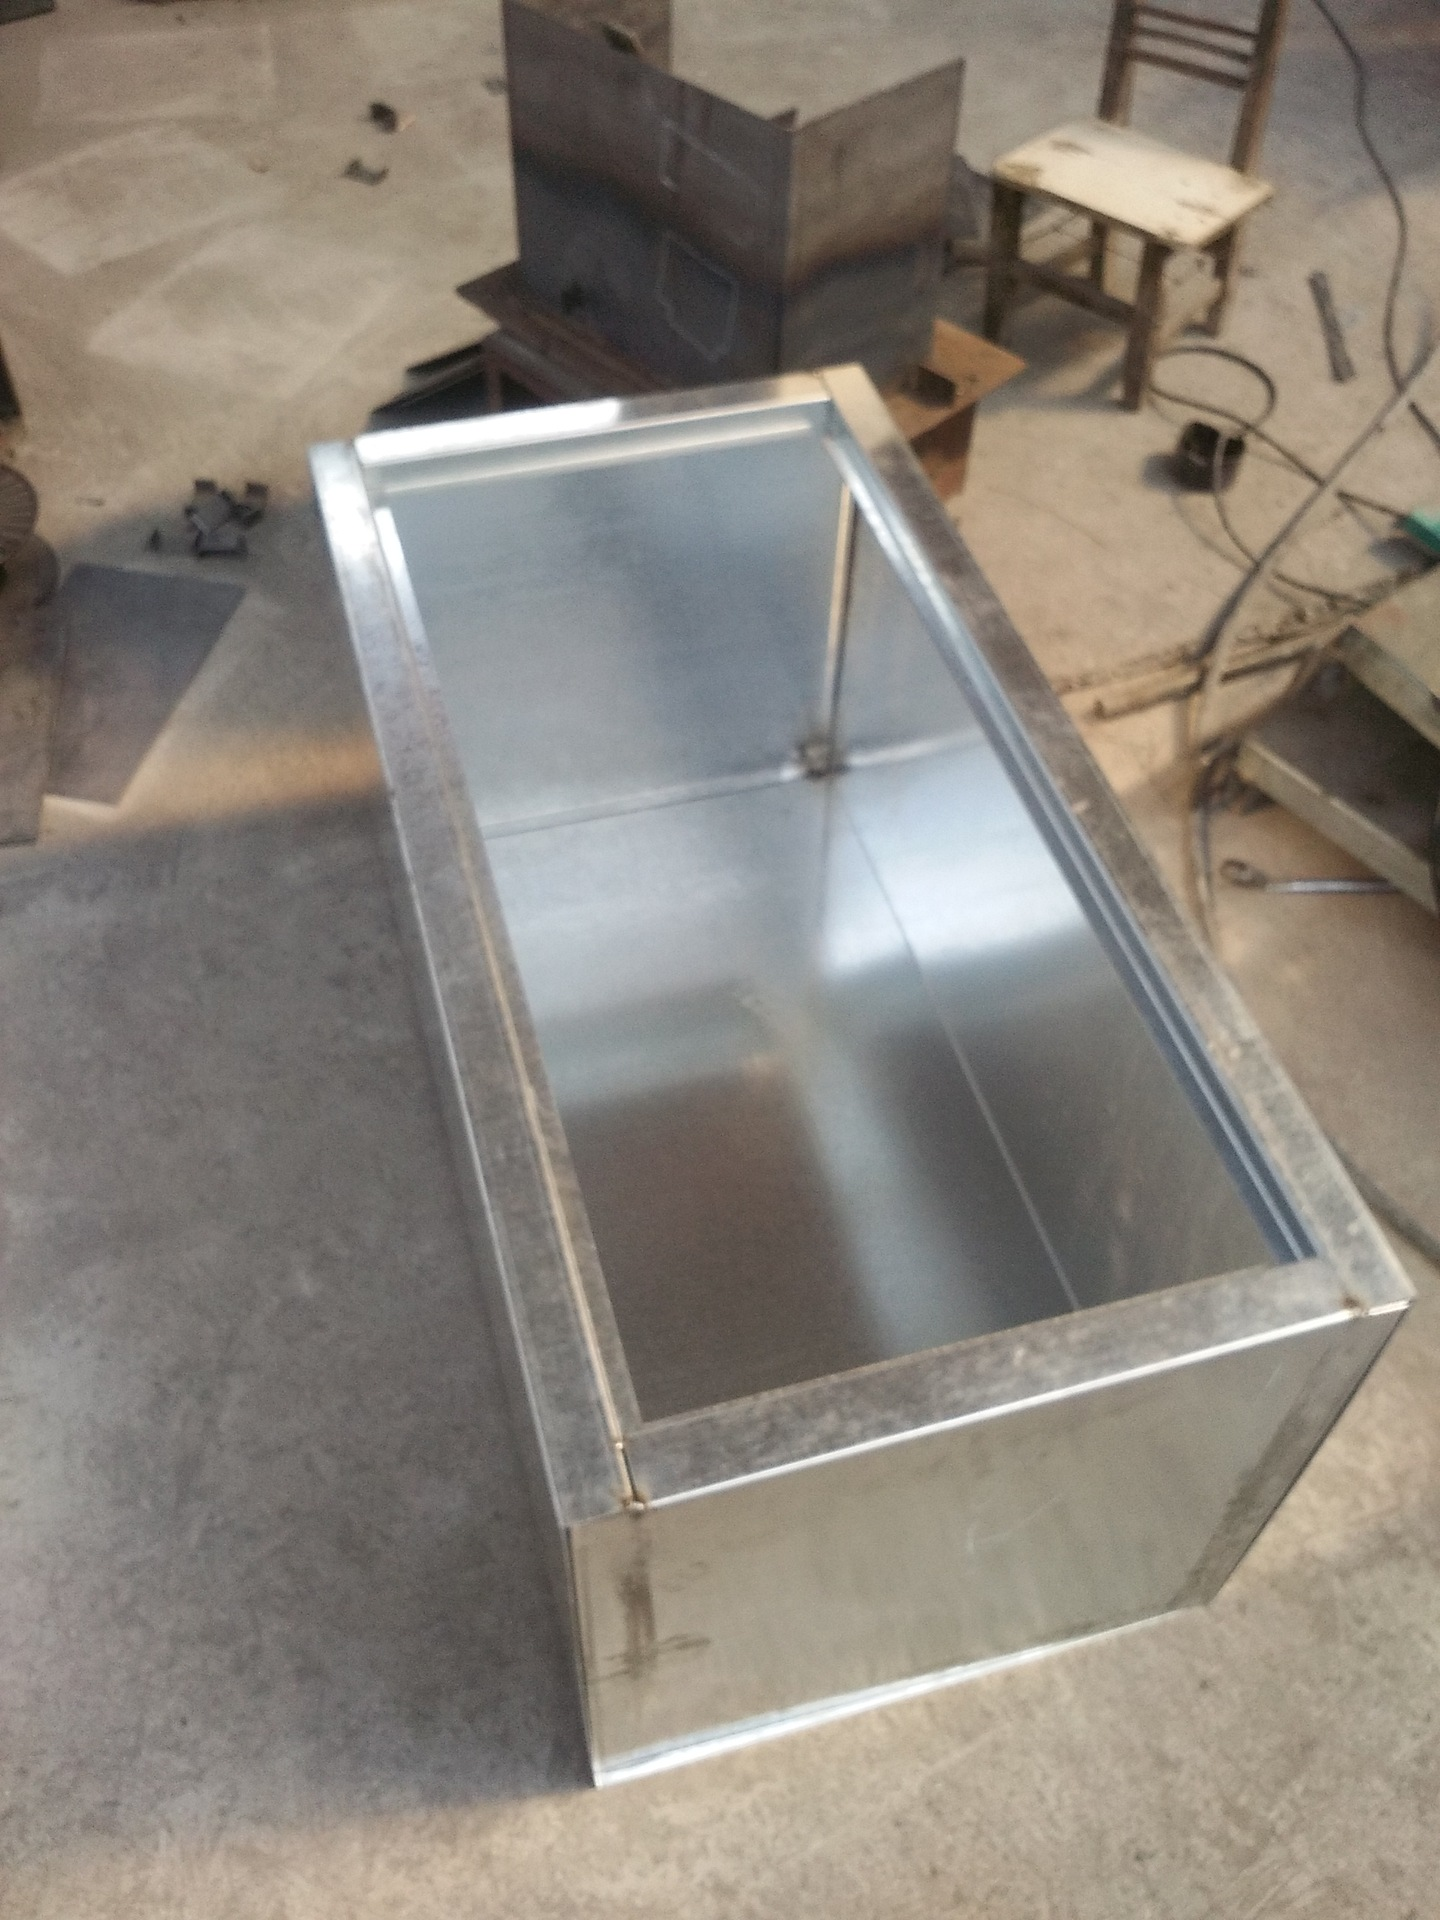 Tôn mạ kẽm  Spot galvanized iron sheet galvanized sheet galvanized environmental protection toolbo